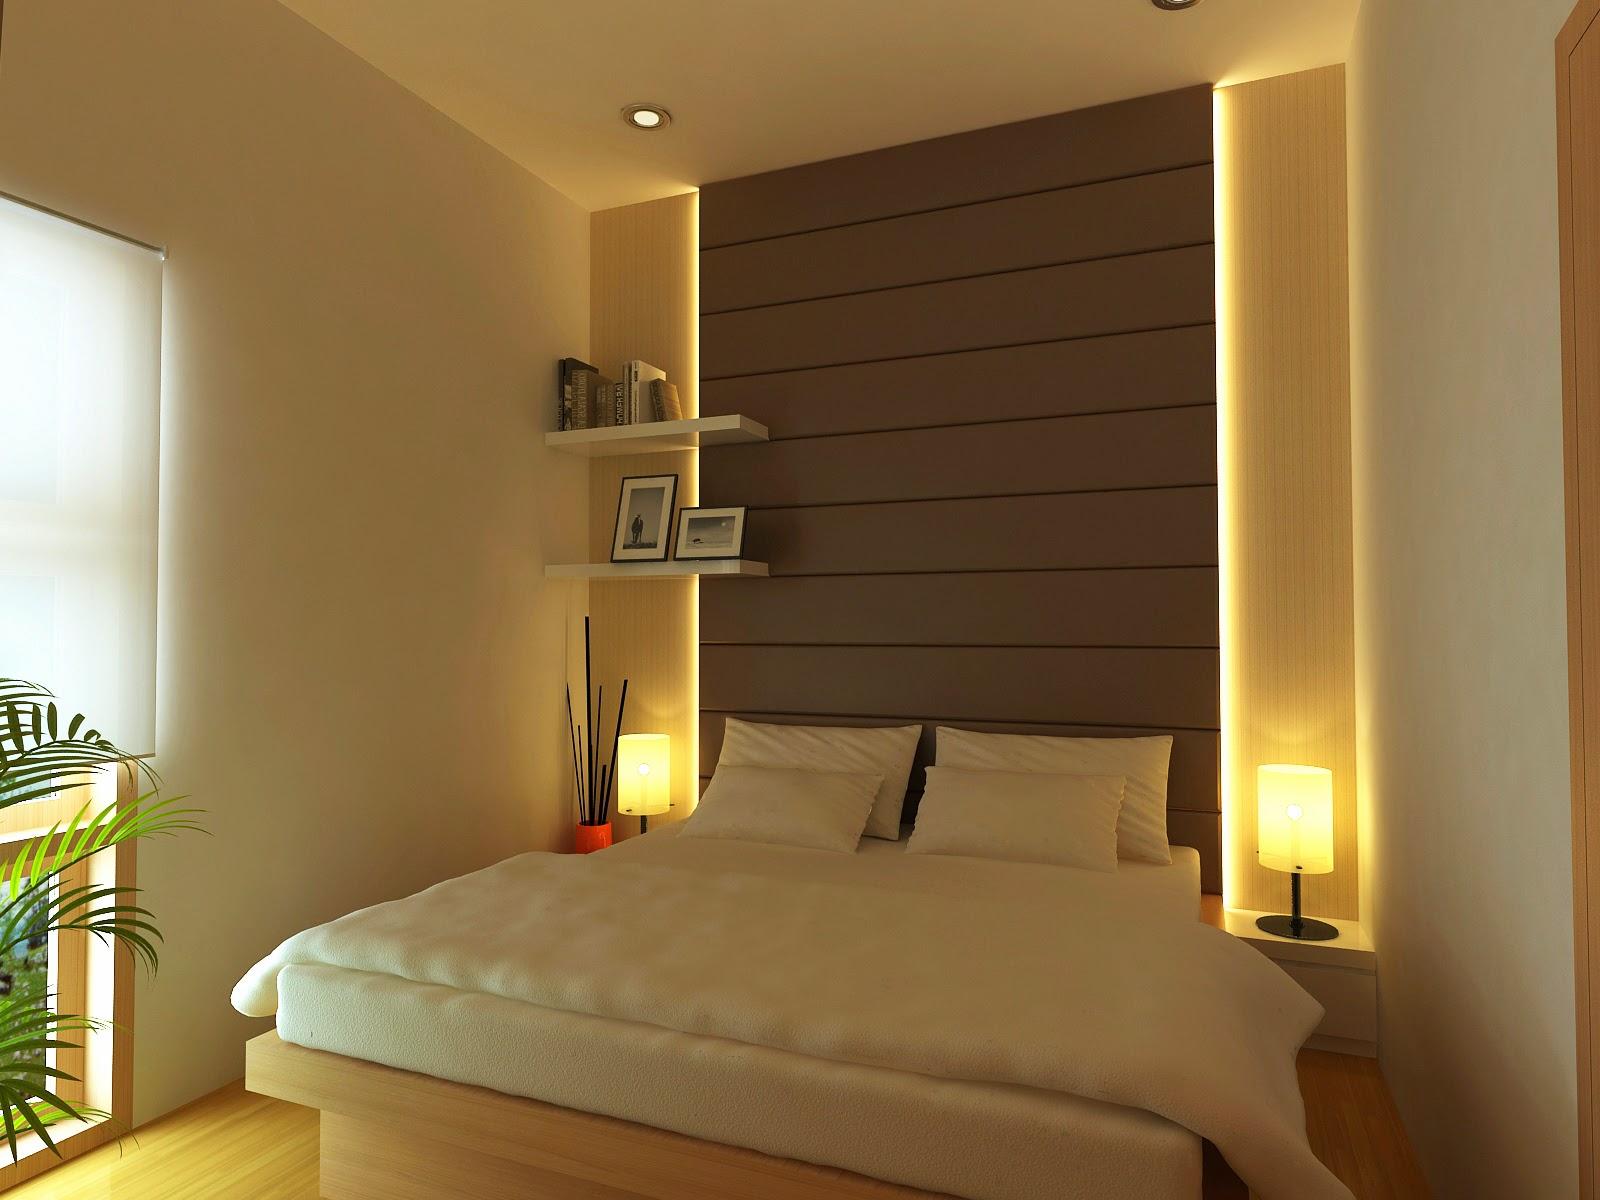 Desain Kamar Tidur Minimalis Ukuran 3x3  Home Interior Design Trends